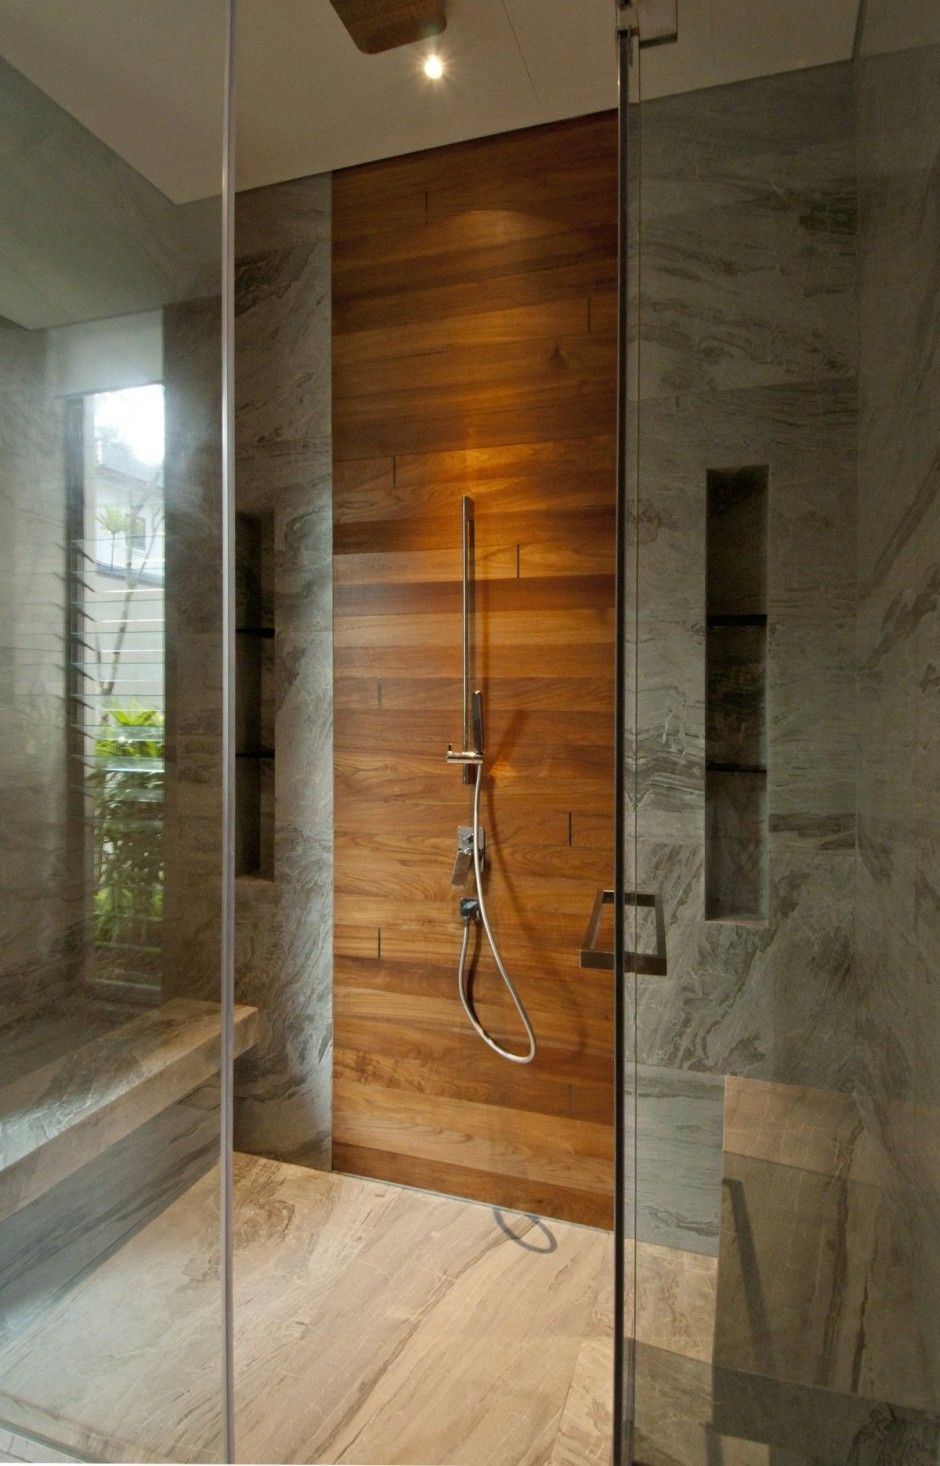 Badezimmer dekor hinter wc sunset terrace by acollective  singapore  dream home  pinterest